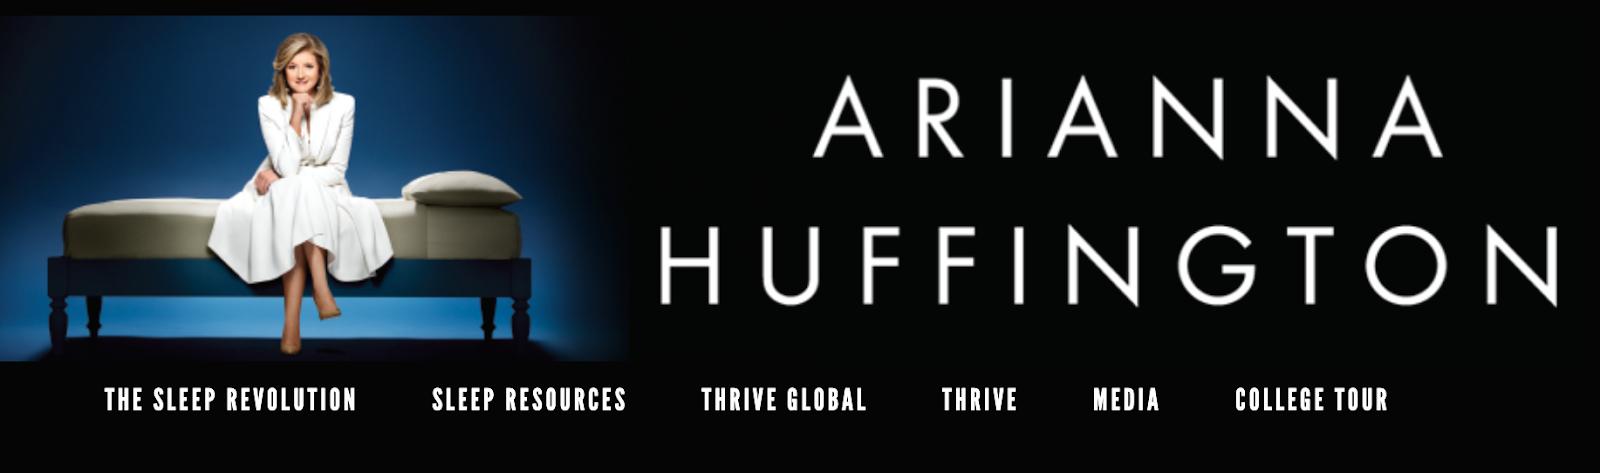 Arianna Huffington | Author & Business Influencer